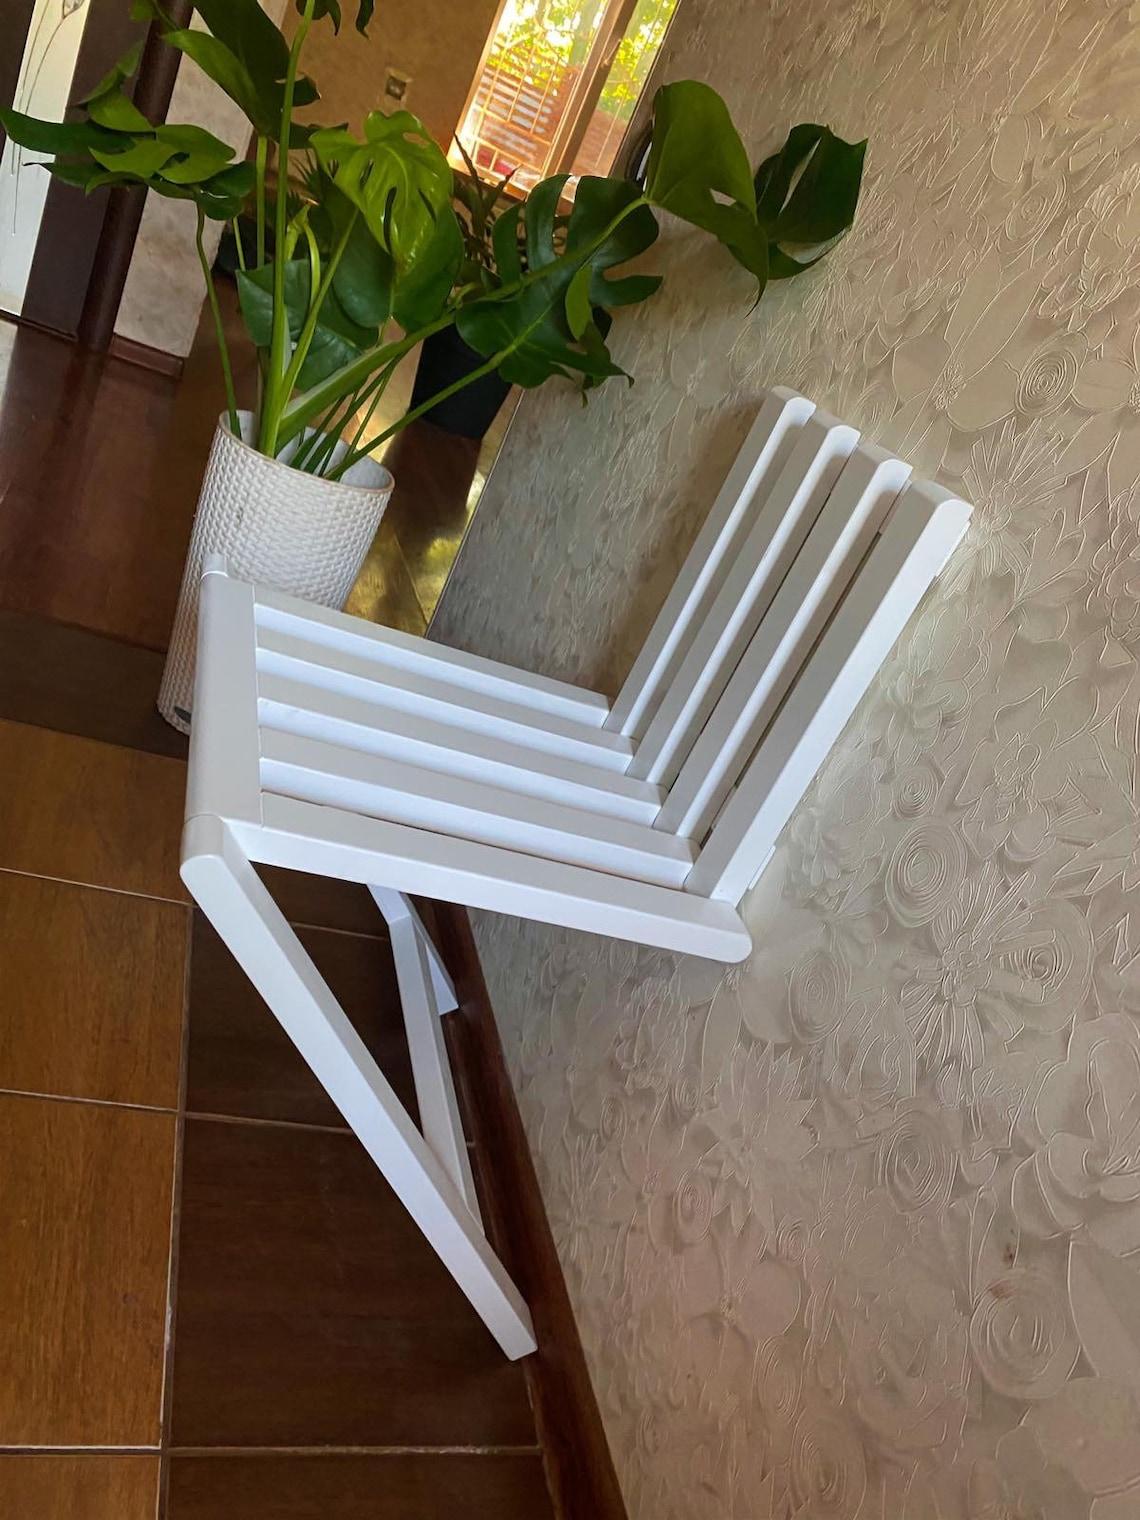 folding chair in the hallway, folding chair, hallway chair, hallway folding chair, wall-mounted folding chair